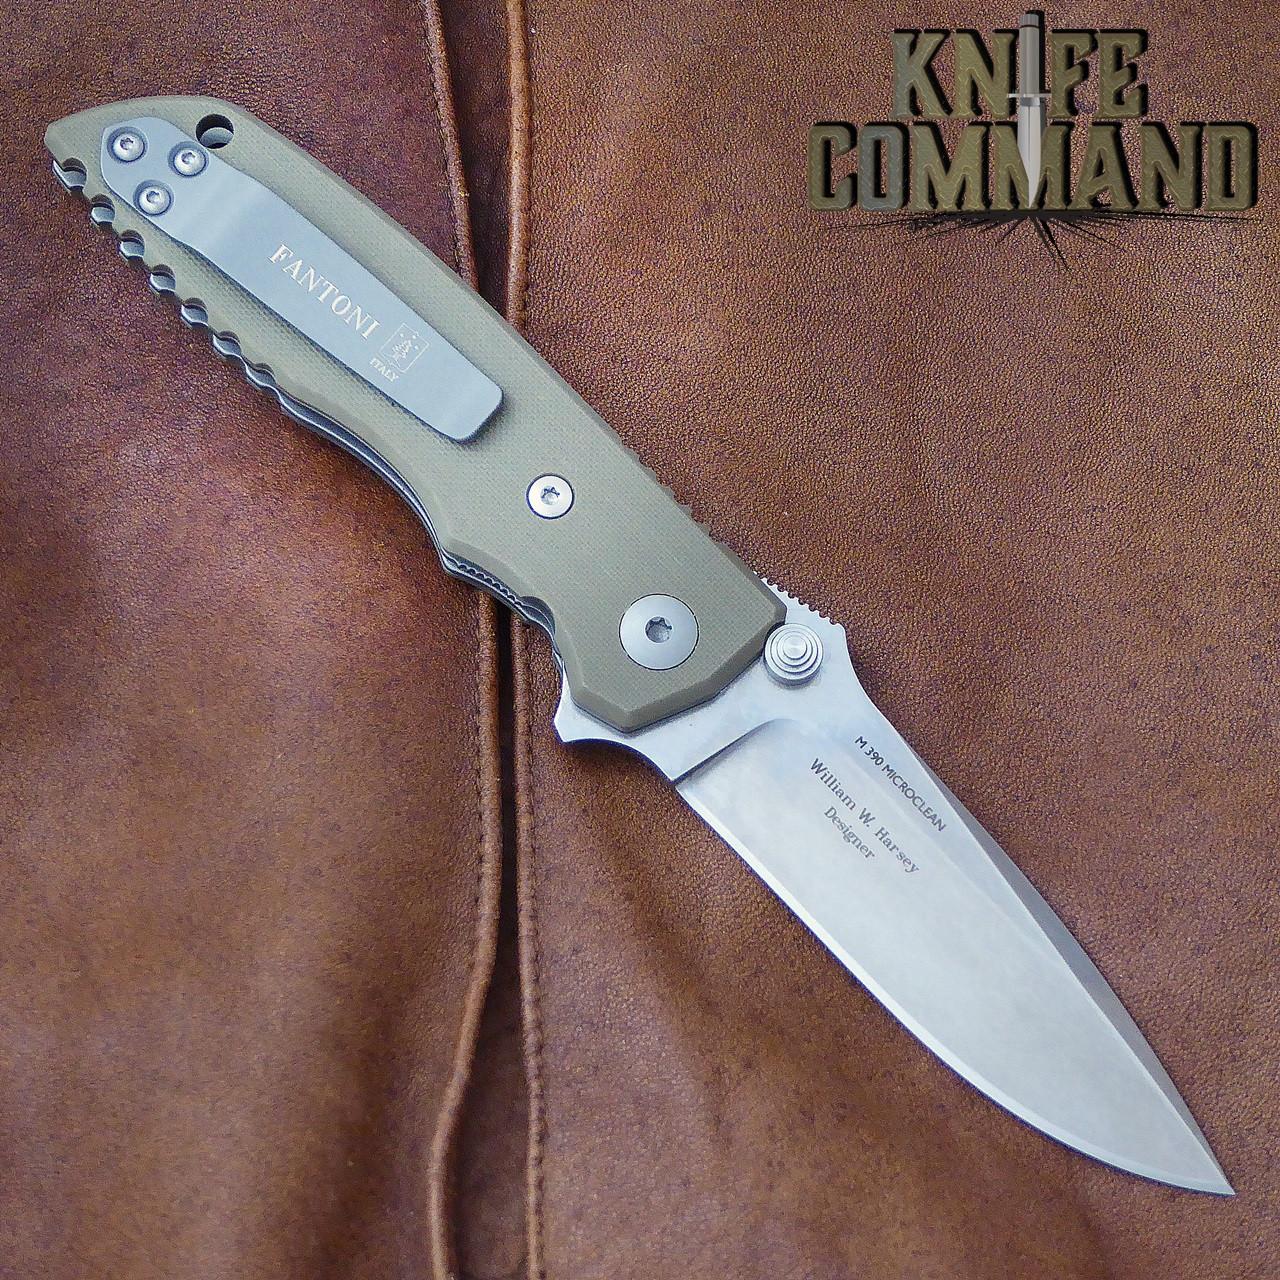 Fantoni HB 03 M390 William Harsey Combat Folder Tactical Knife OD Green.  Titanium liners.